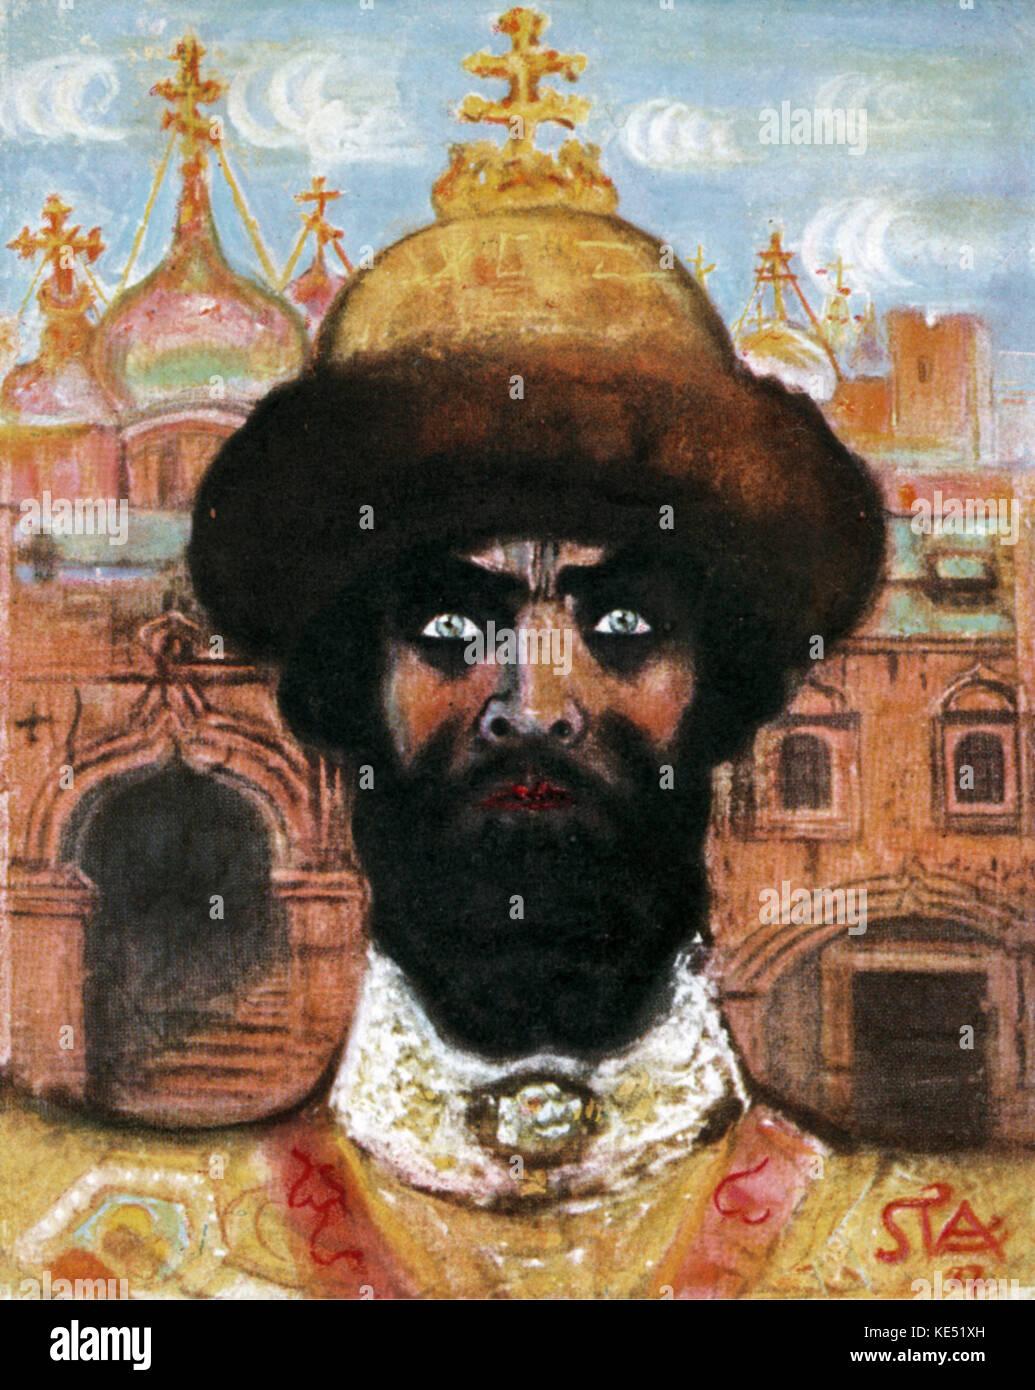 Feodor Ivanovich Chaliapin, the Russian opera singer, as 'Boris Godunov' in Modest Mussorgsky 's opera. - Stock Image